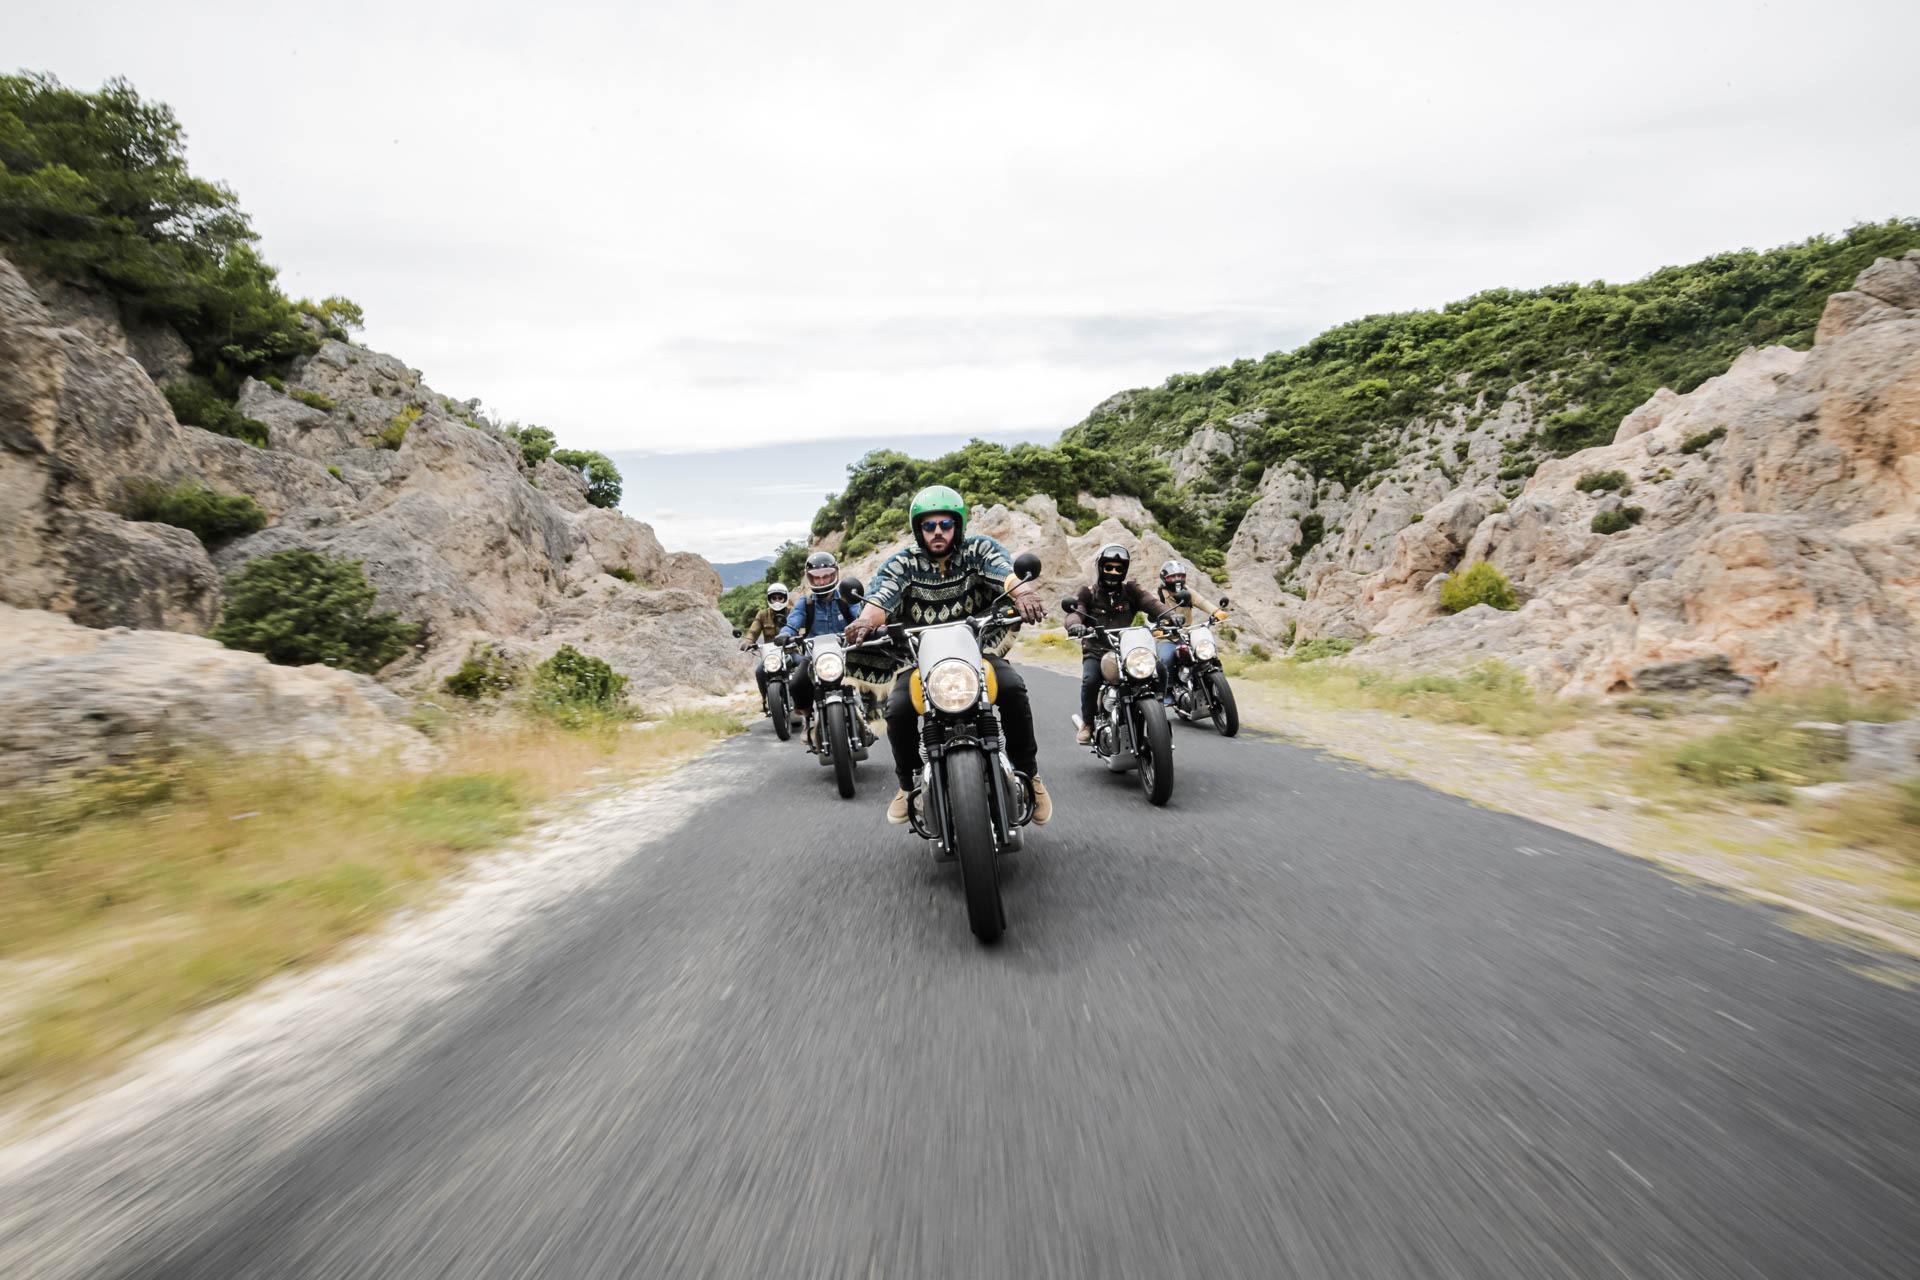 Rouler entre amis - week-end road trip Occitanie Damien Lorrai